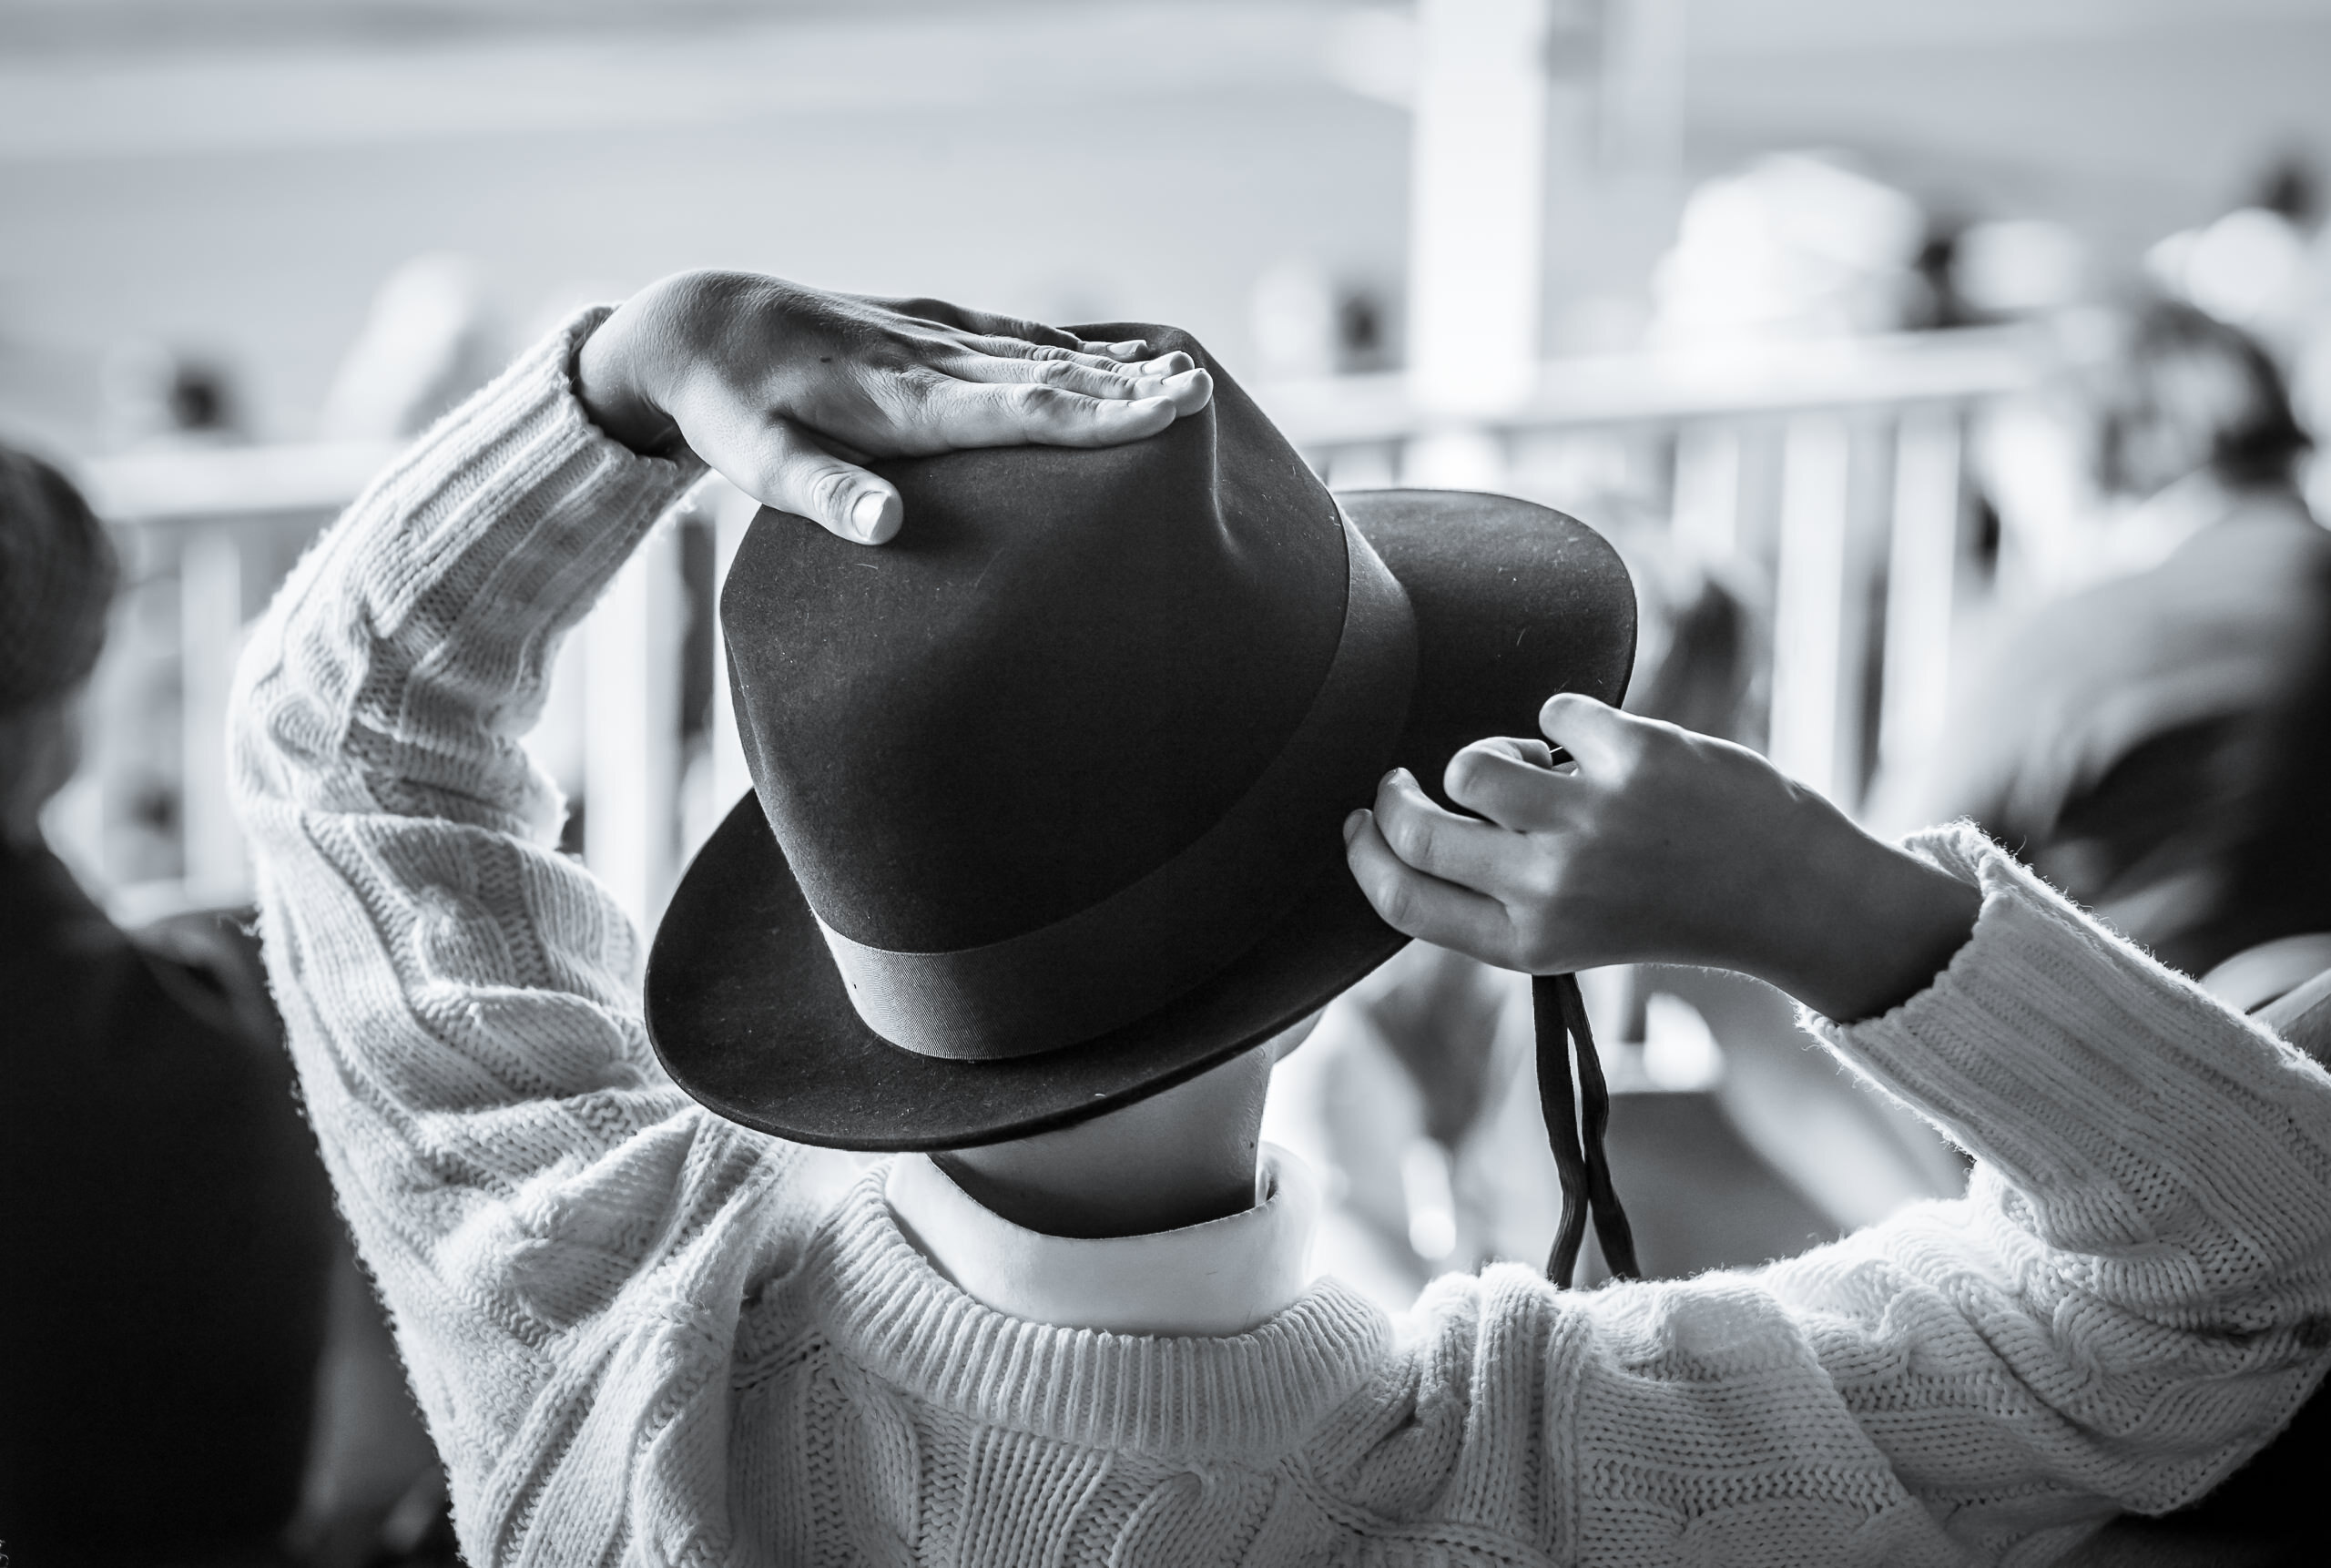 Wayfinder Workshop 21Mm Summilux Goodwood Revival Grandstand Boys By Brett Leica Photographer